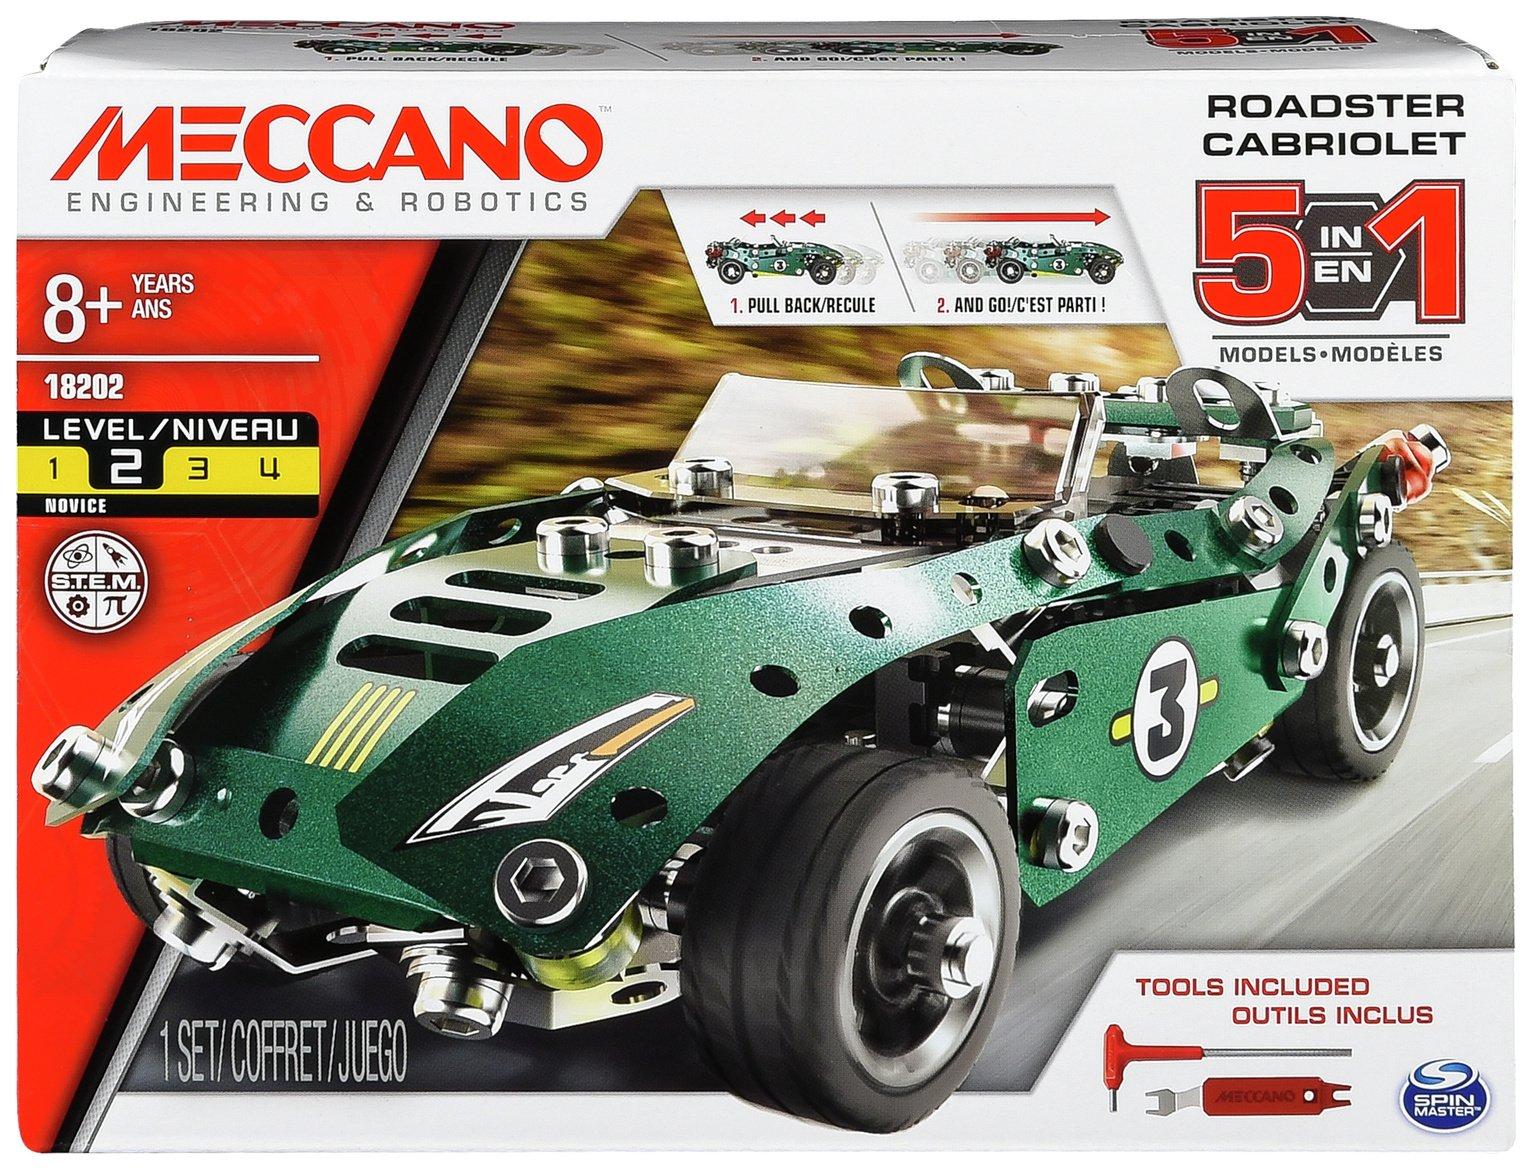 Meccano 5 Model Roadster Set